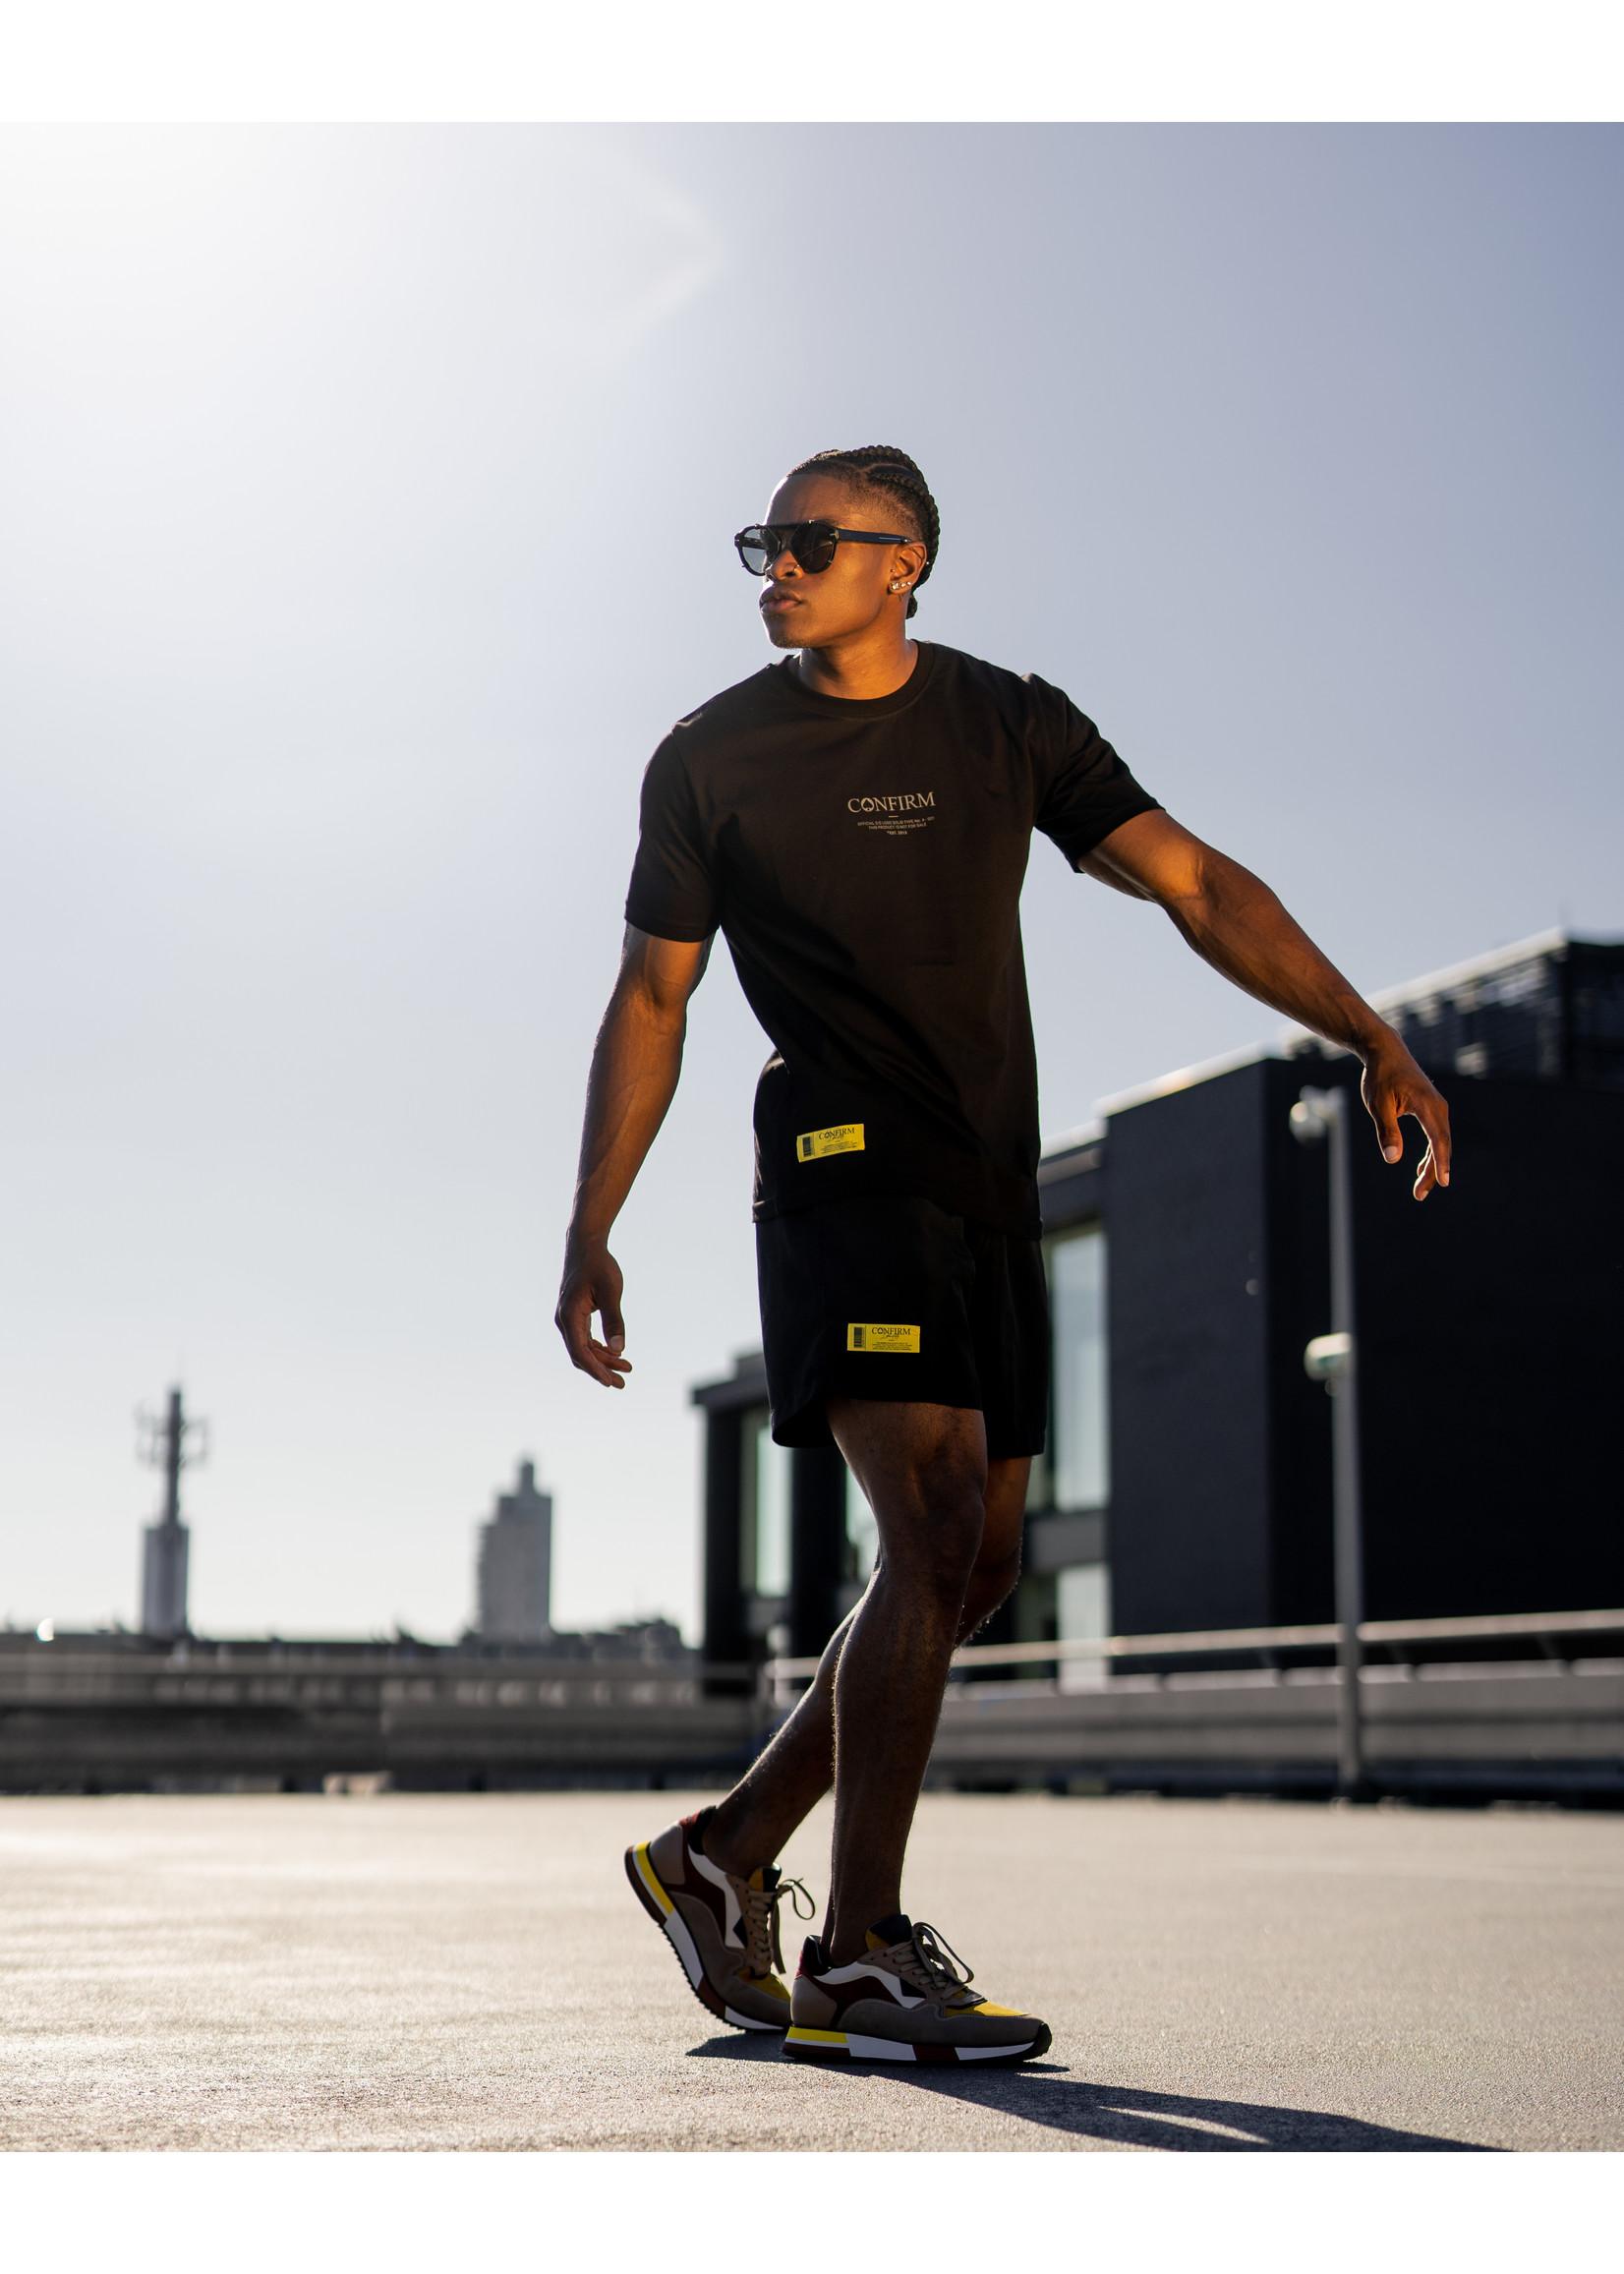 Confirm brand swim short O.G. - black/yellow